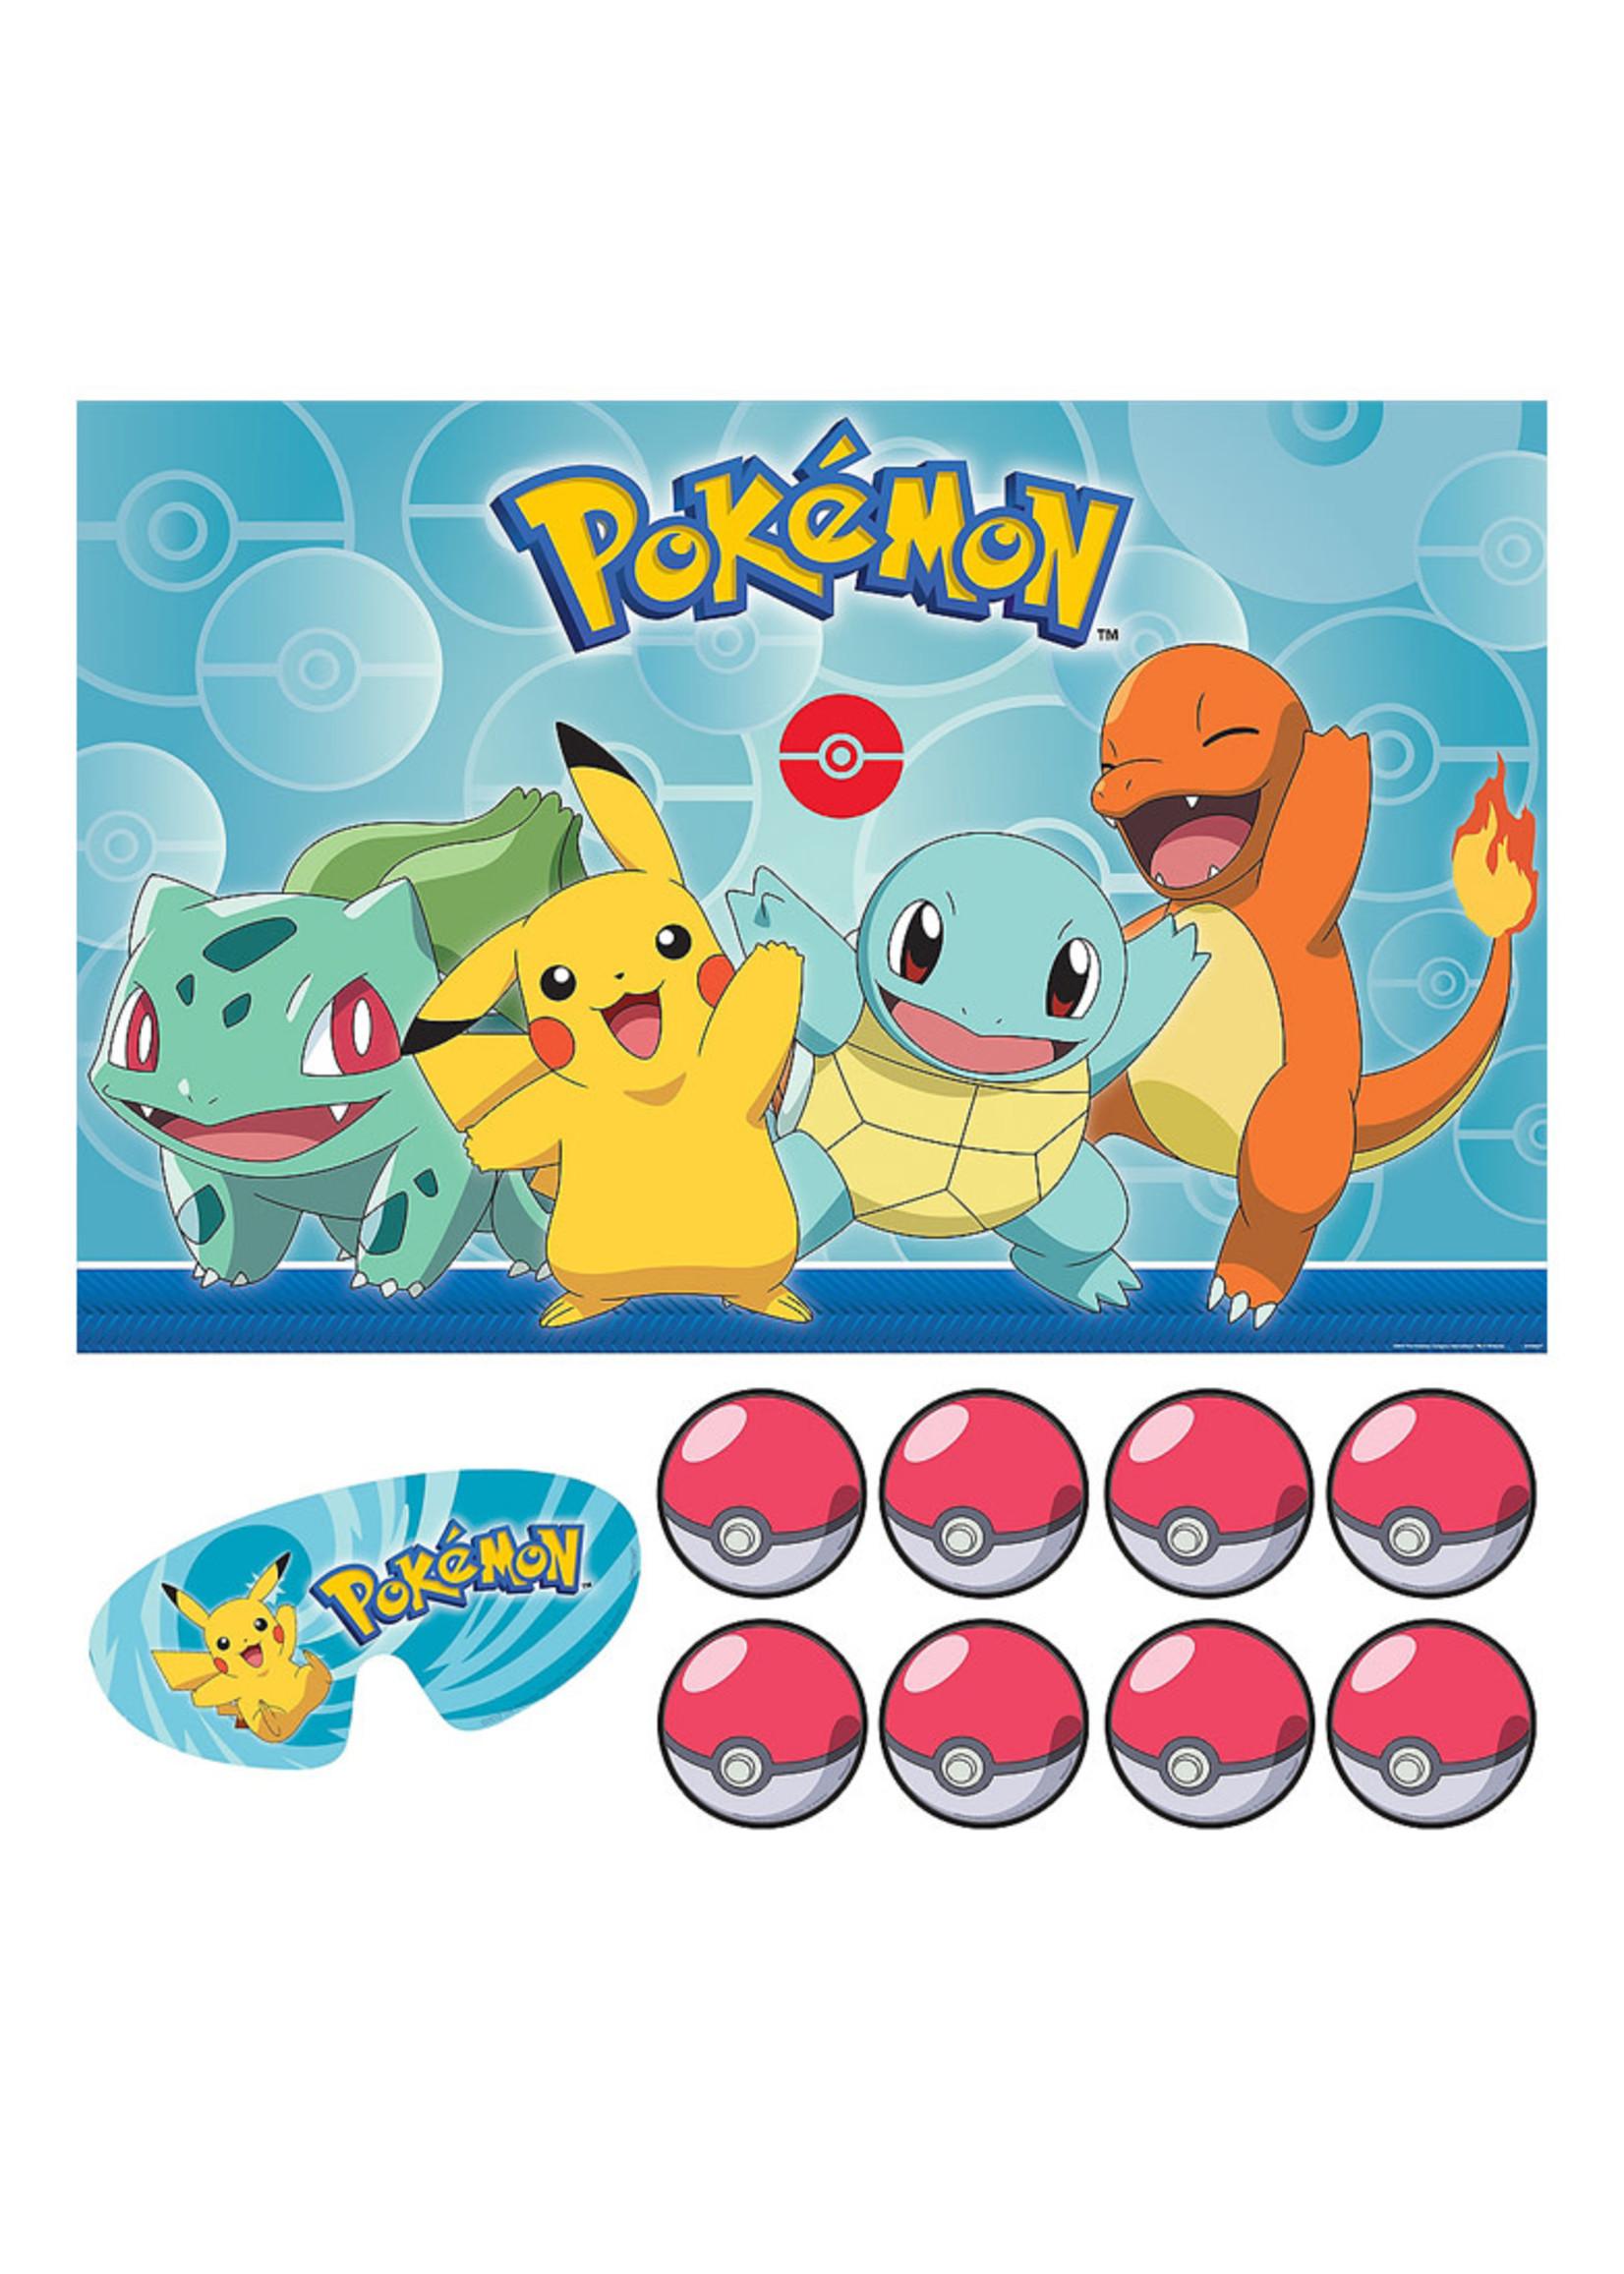 Classic Pokémon Party Game